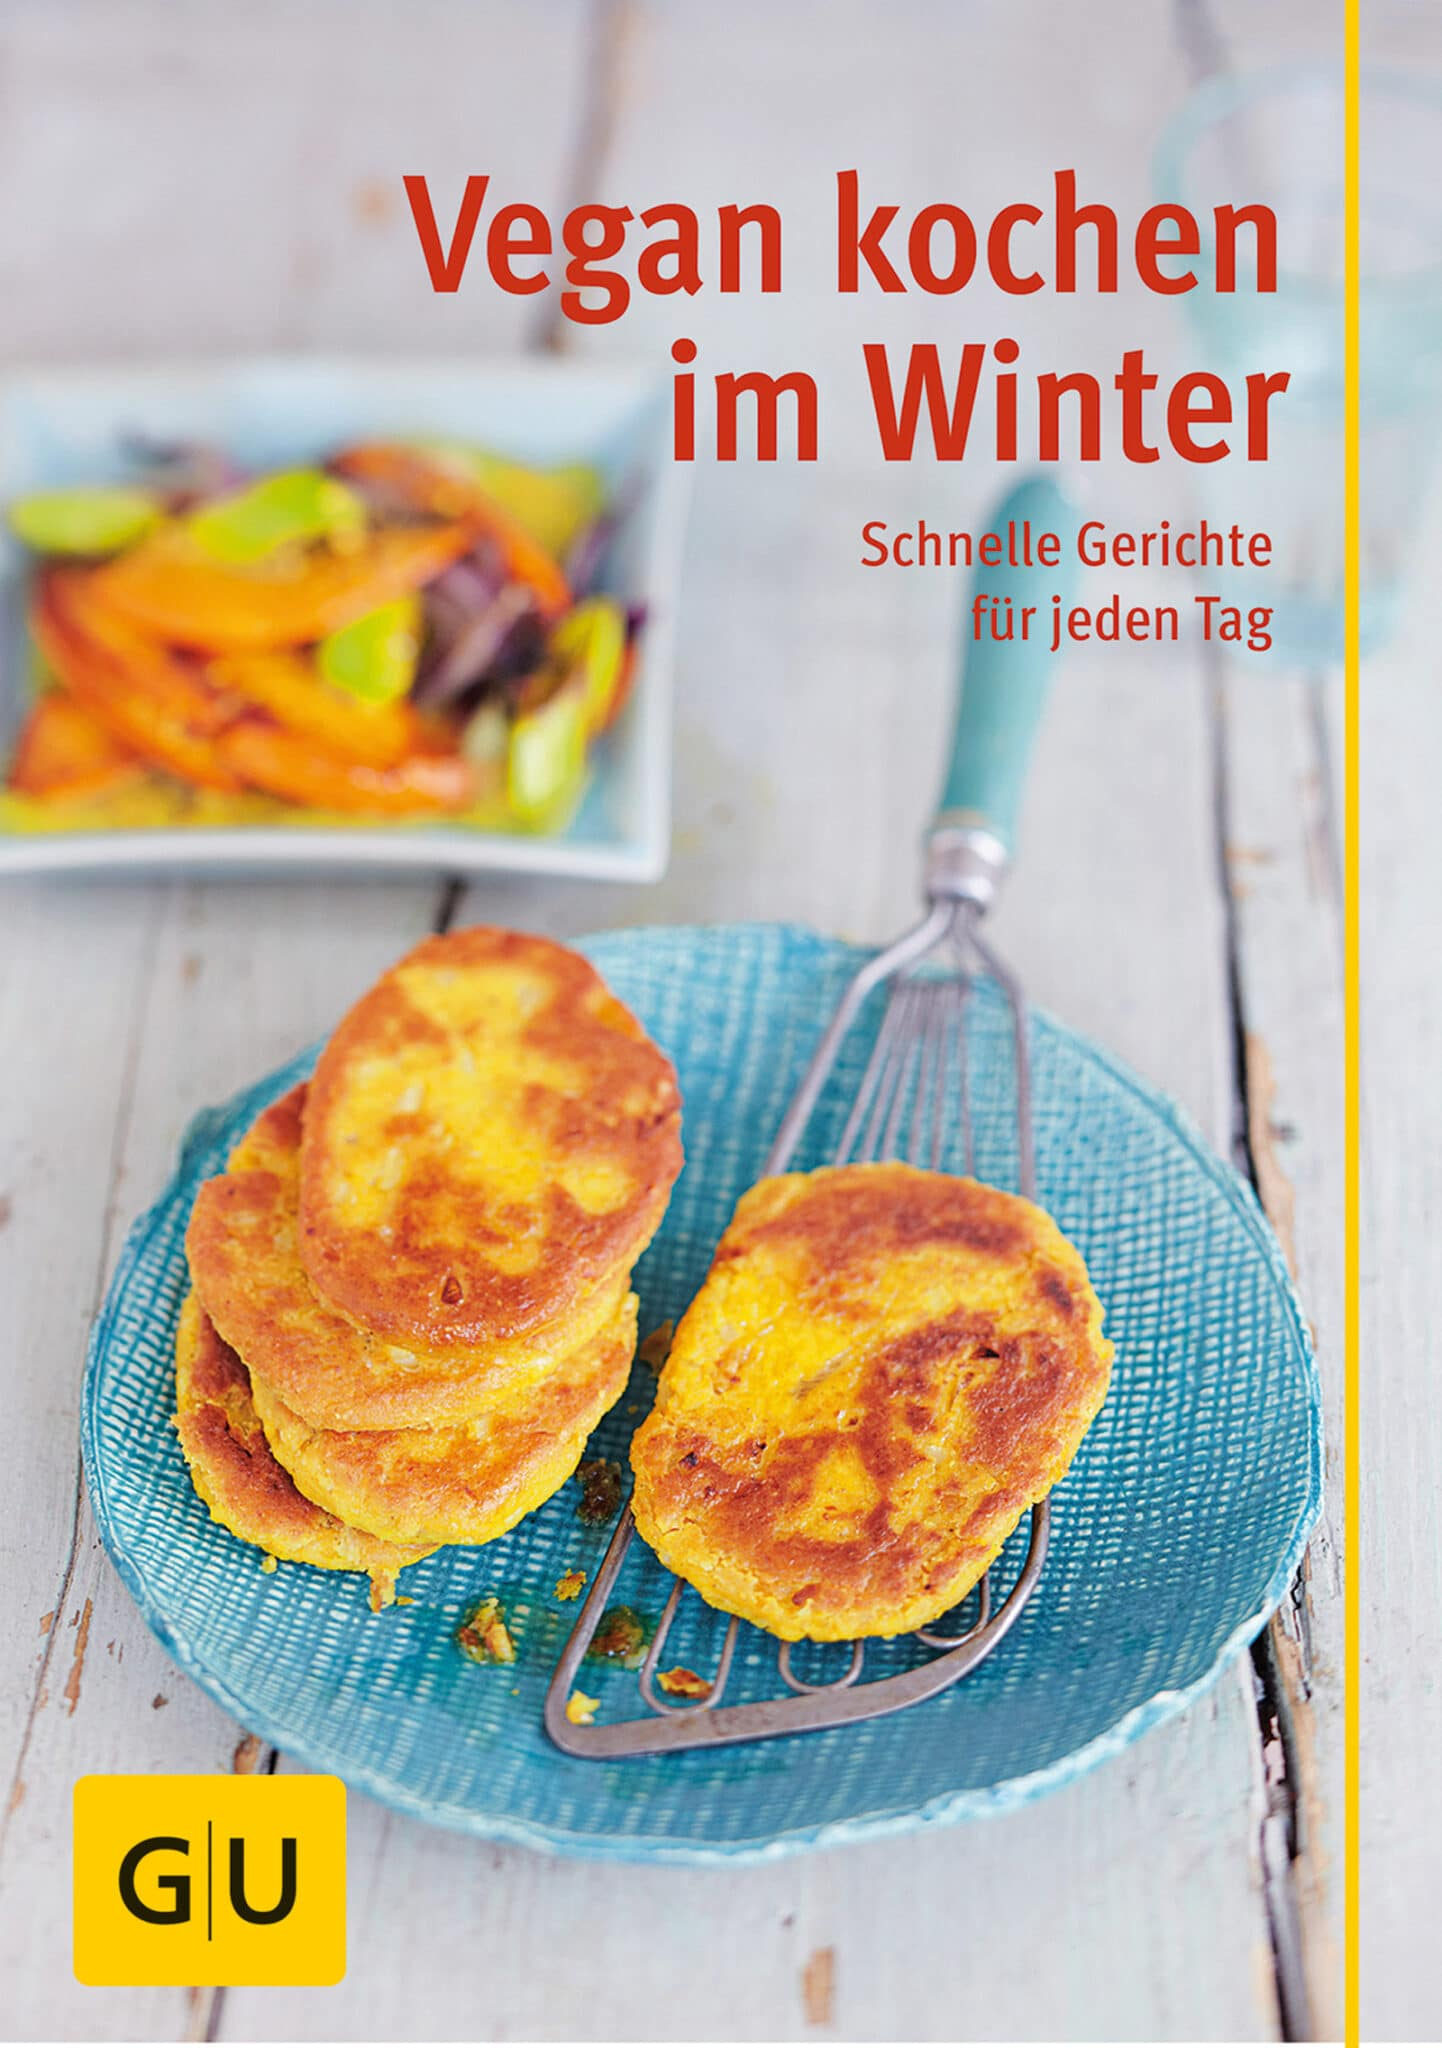 Vegan kochen im Winter